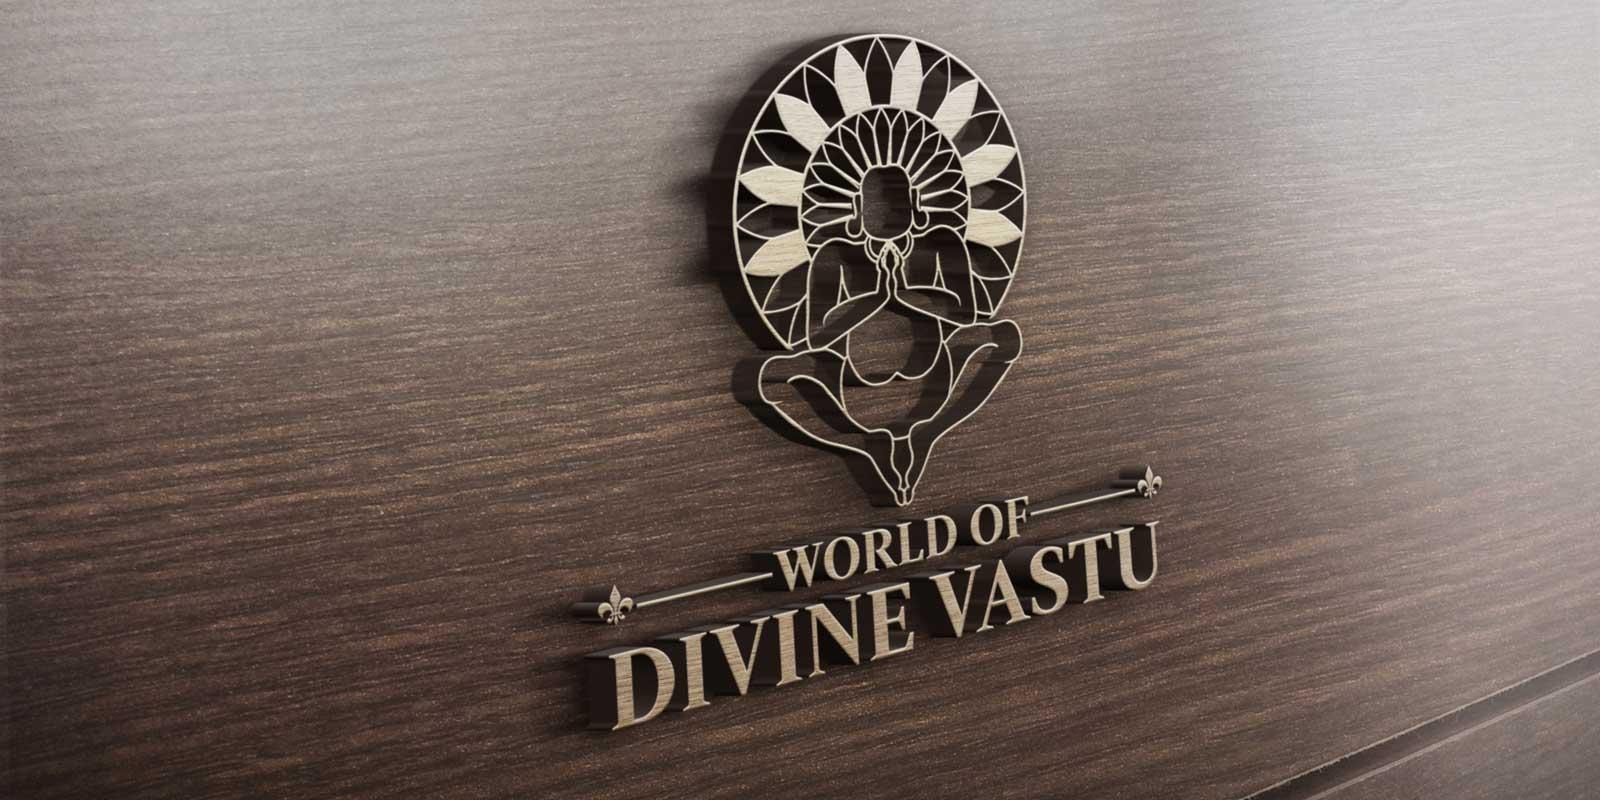 Divine-Vastu-banner